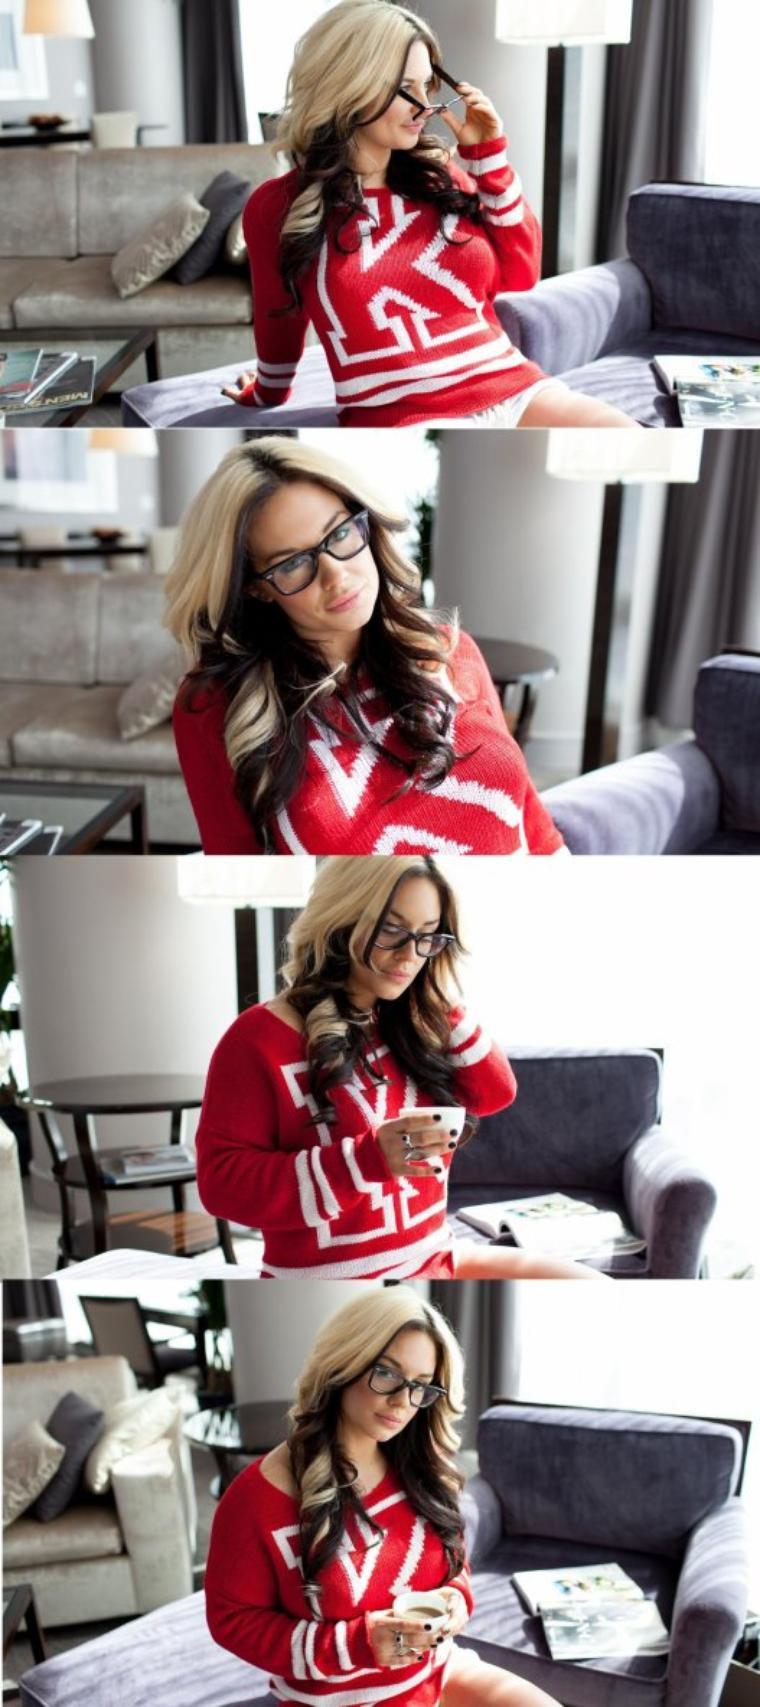 new photoshoot de kaitlyn